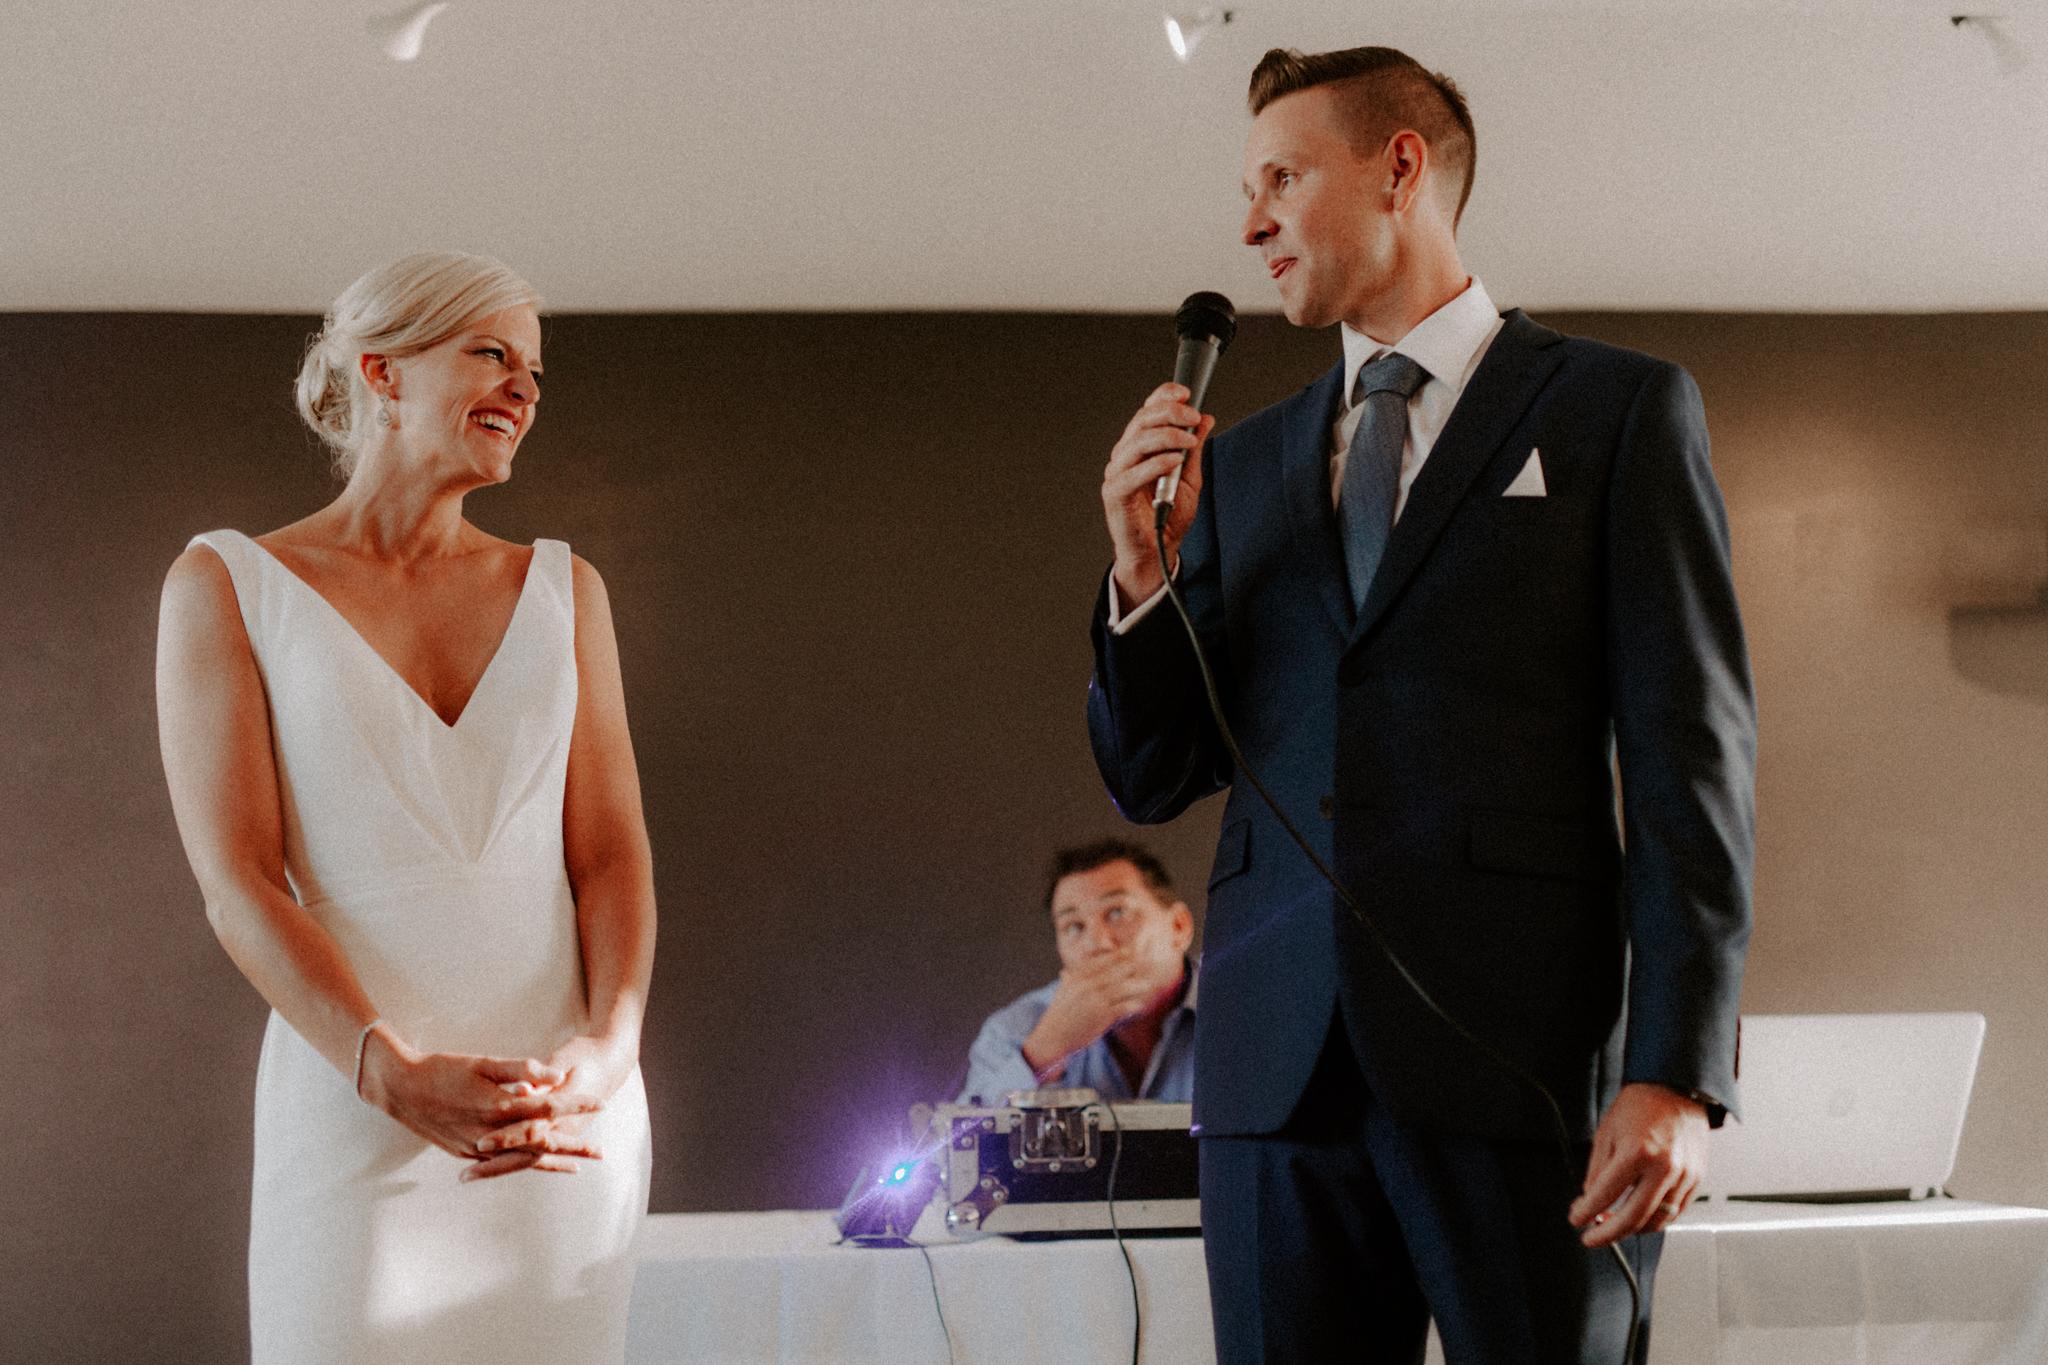 St-Kilda-Garden-Wedding-Emotions-and-Math-Photograph-195.jpg